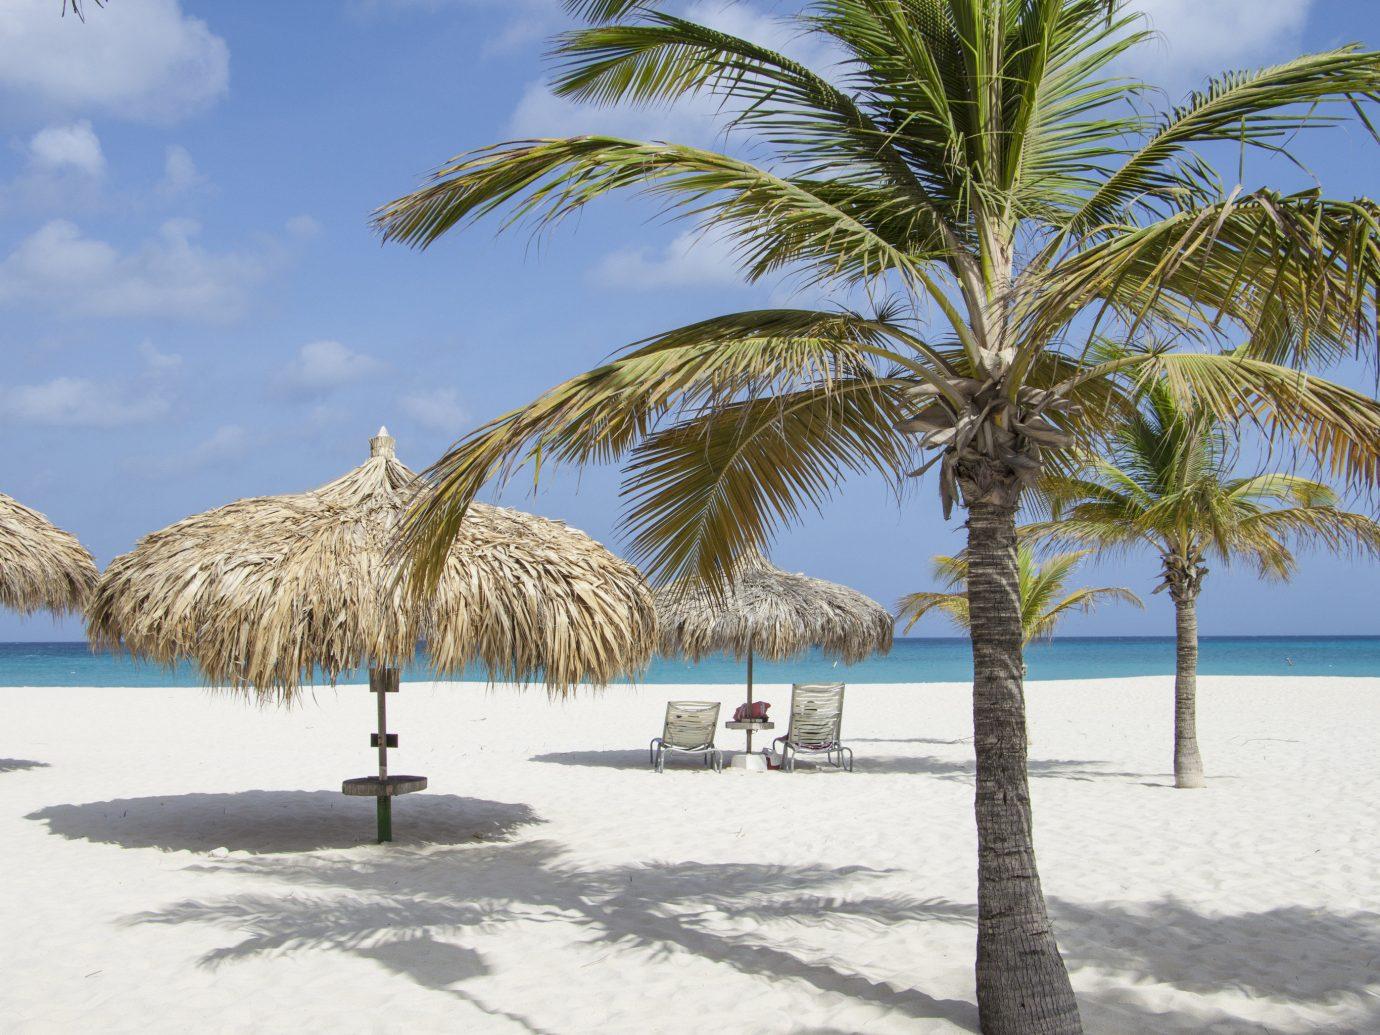 Aruba Hotels outdoor sky tree palm Beach water body of water palm family vacation Sea Ocean arecales plant shore woody plant sandy Coast caribbean tropics Resort Lagoon bay shade lined day